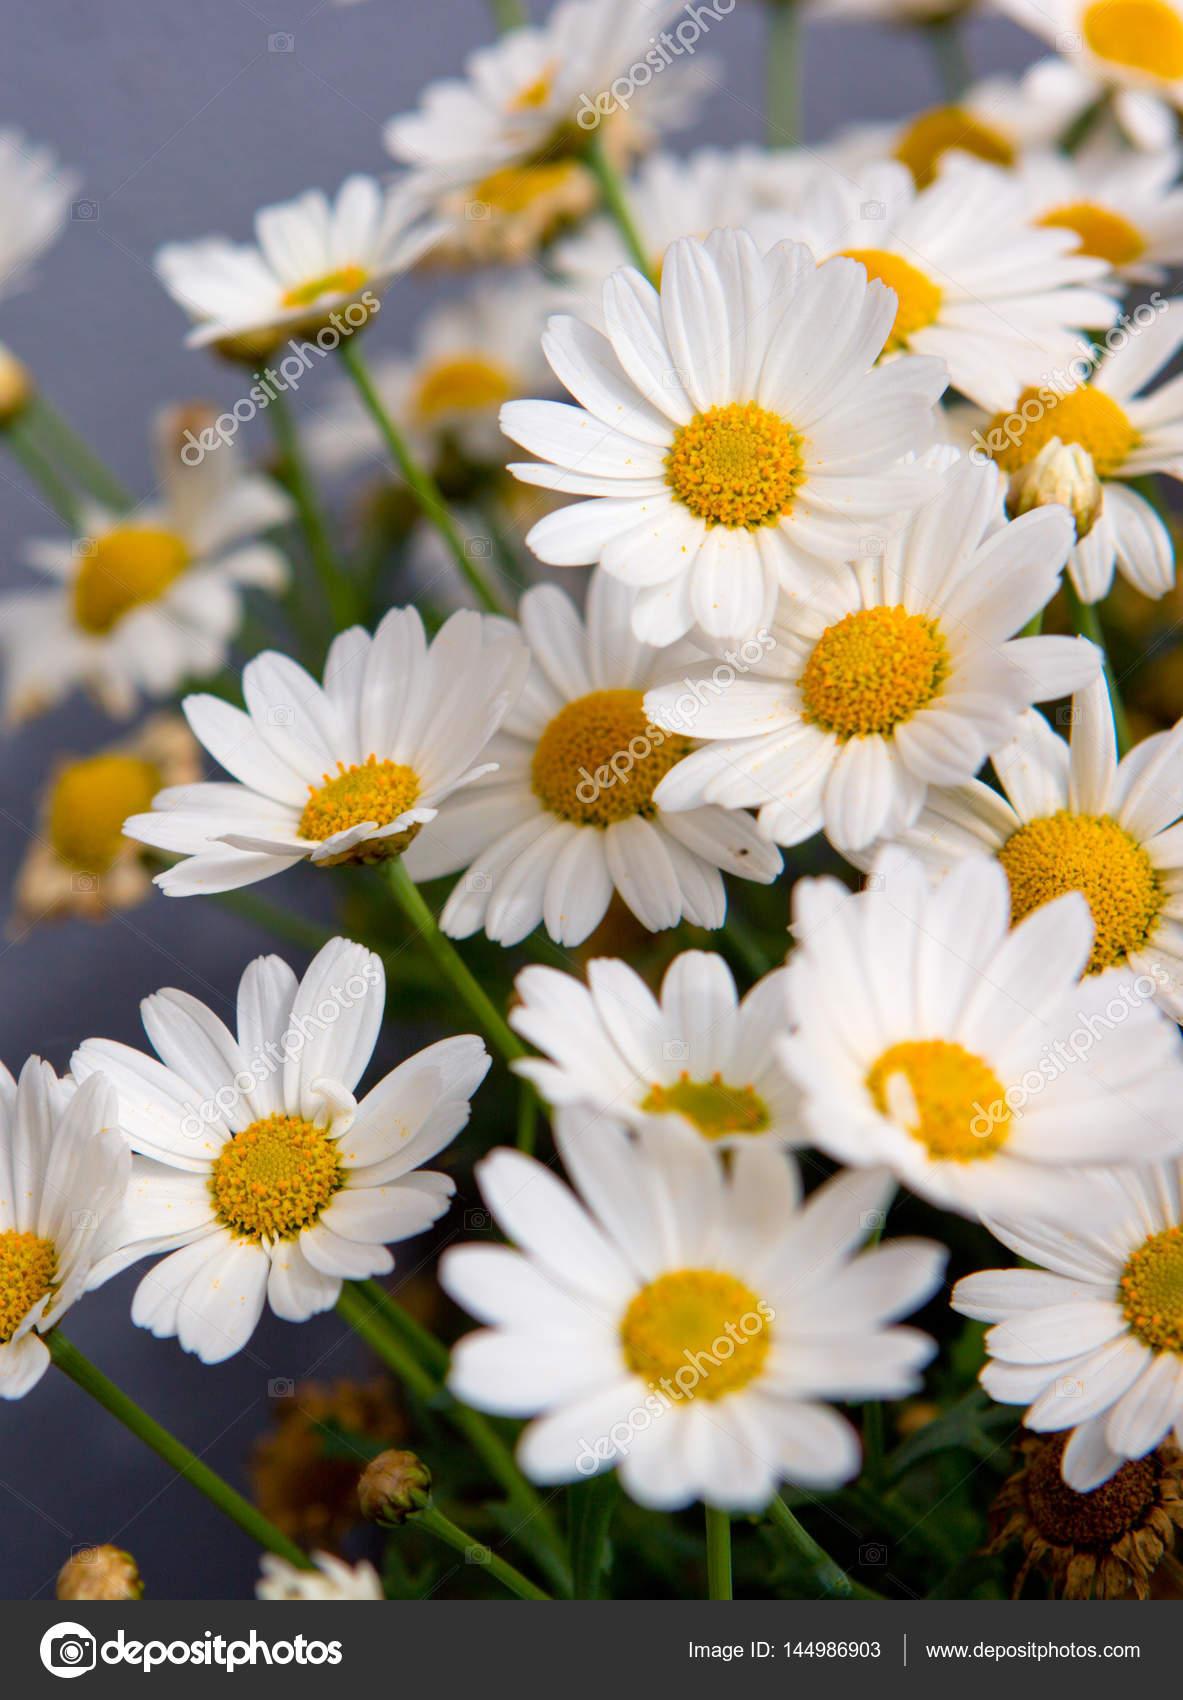 White daisies flowers in bright sun light stock photo swkunst daisy flowers backgroundcro of beautiful white daisies flowers isolated on gray background photo by swkunst izmirmasajfo